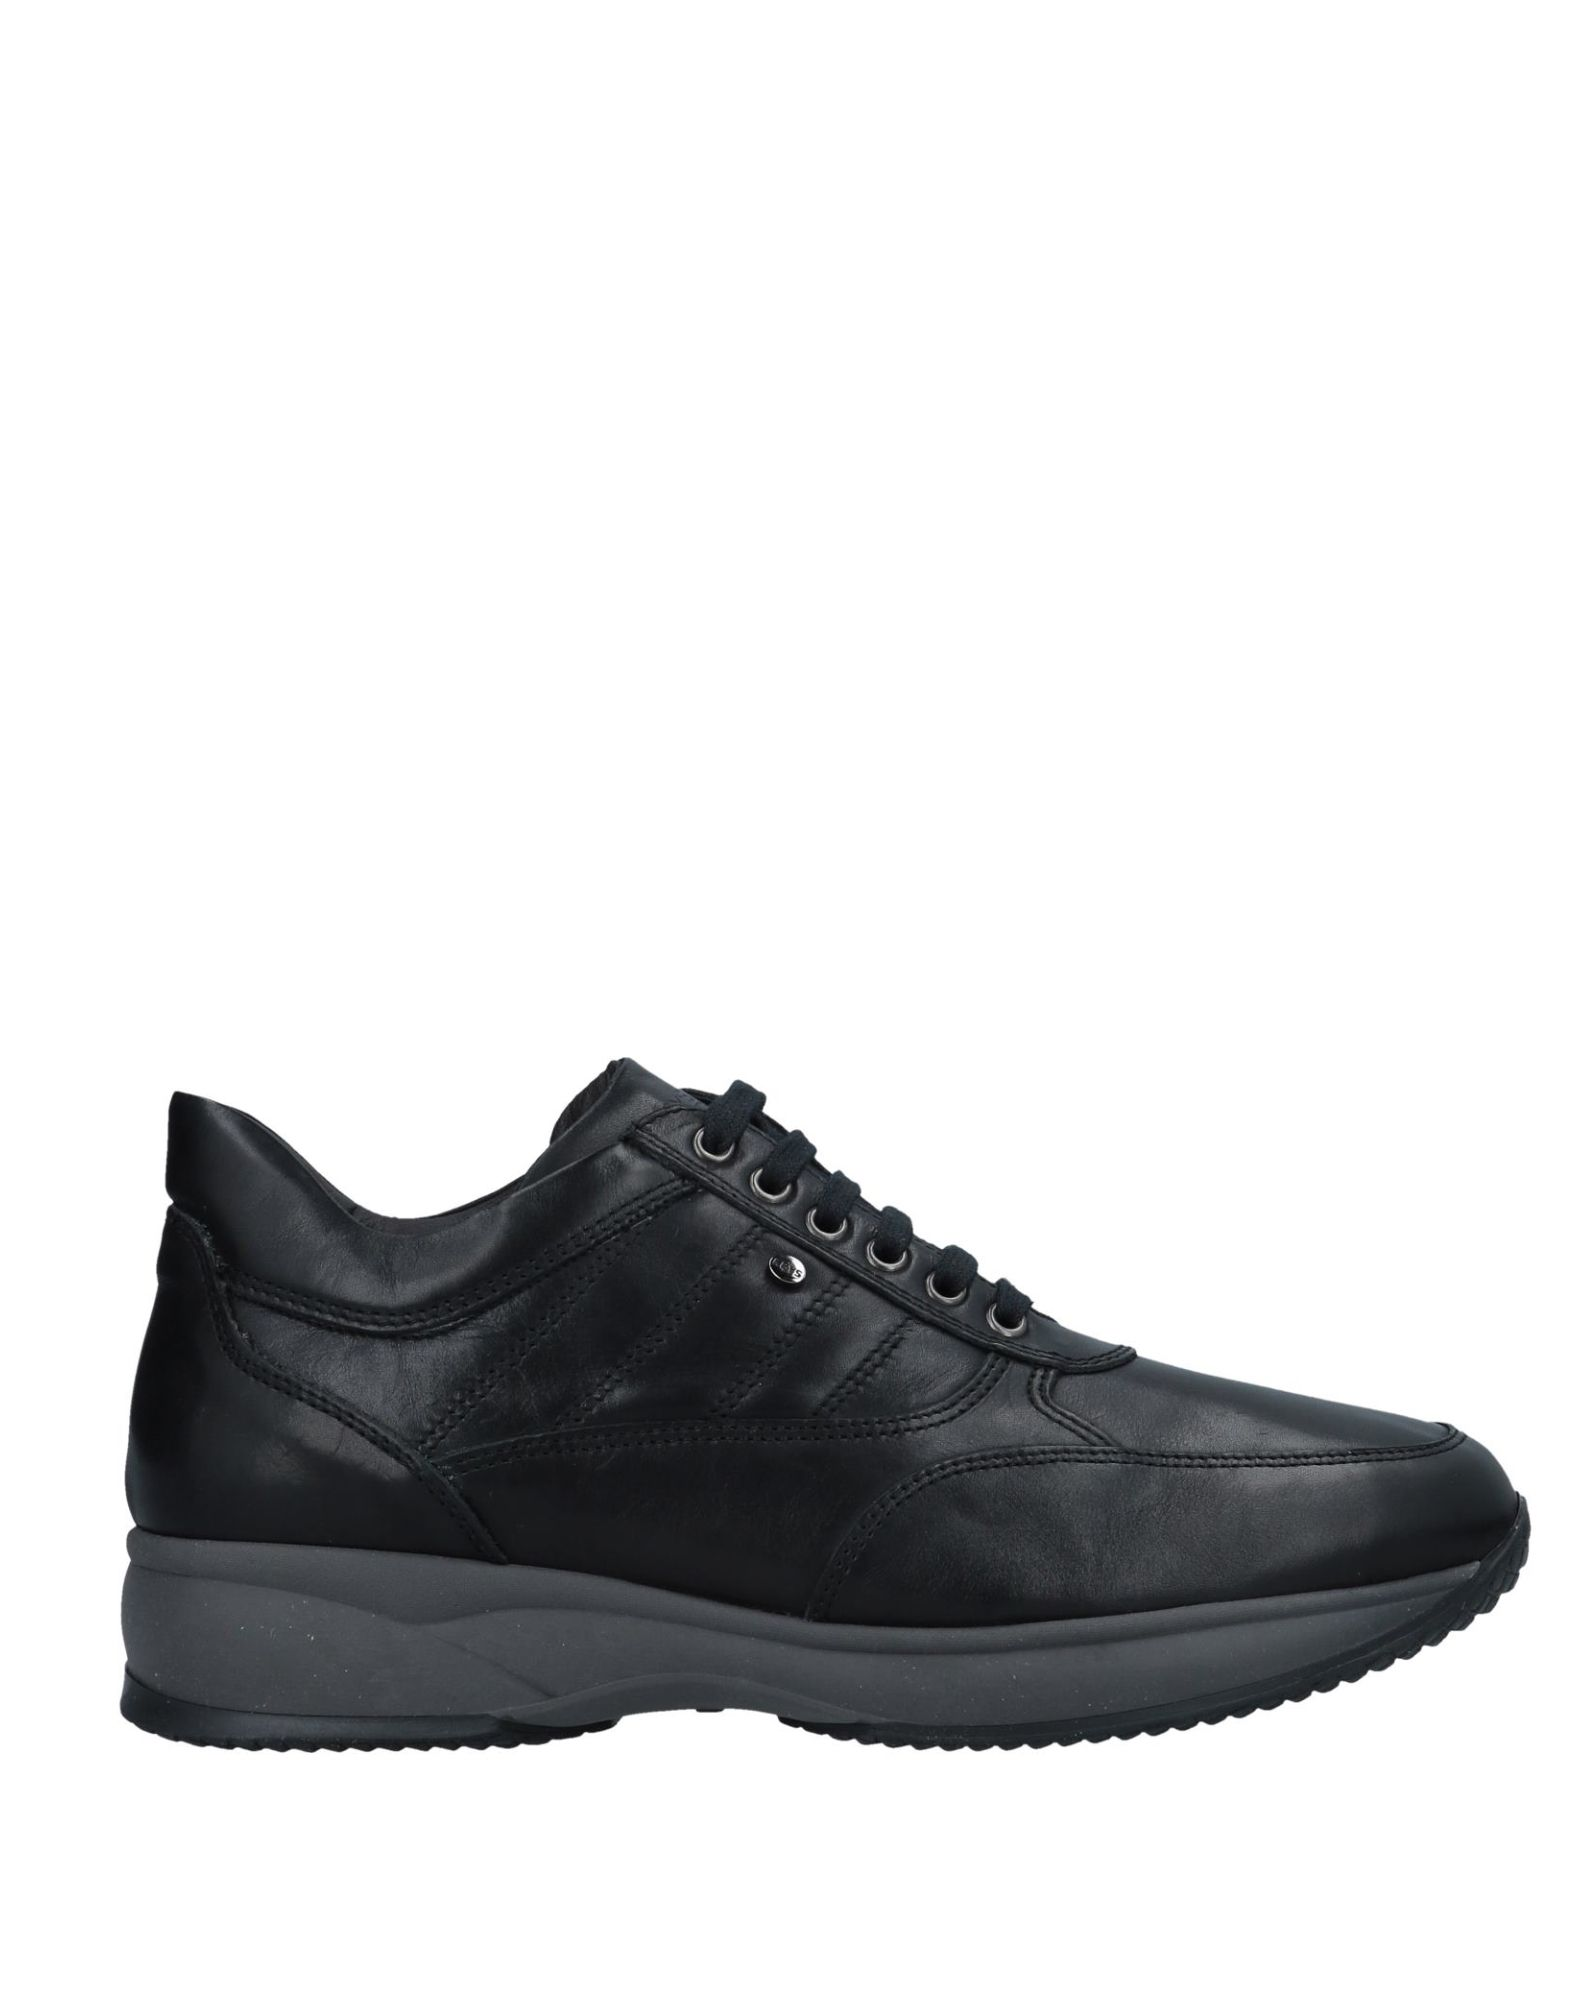 Keys Sneakers Sneakers Sneakers - Men Keys Sneakers online on  United Kingdom - 11550022TG 9edd44